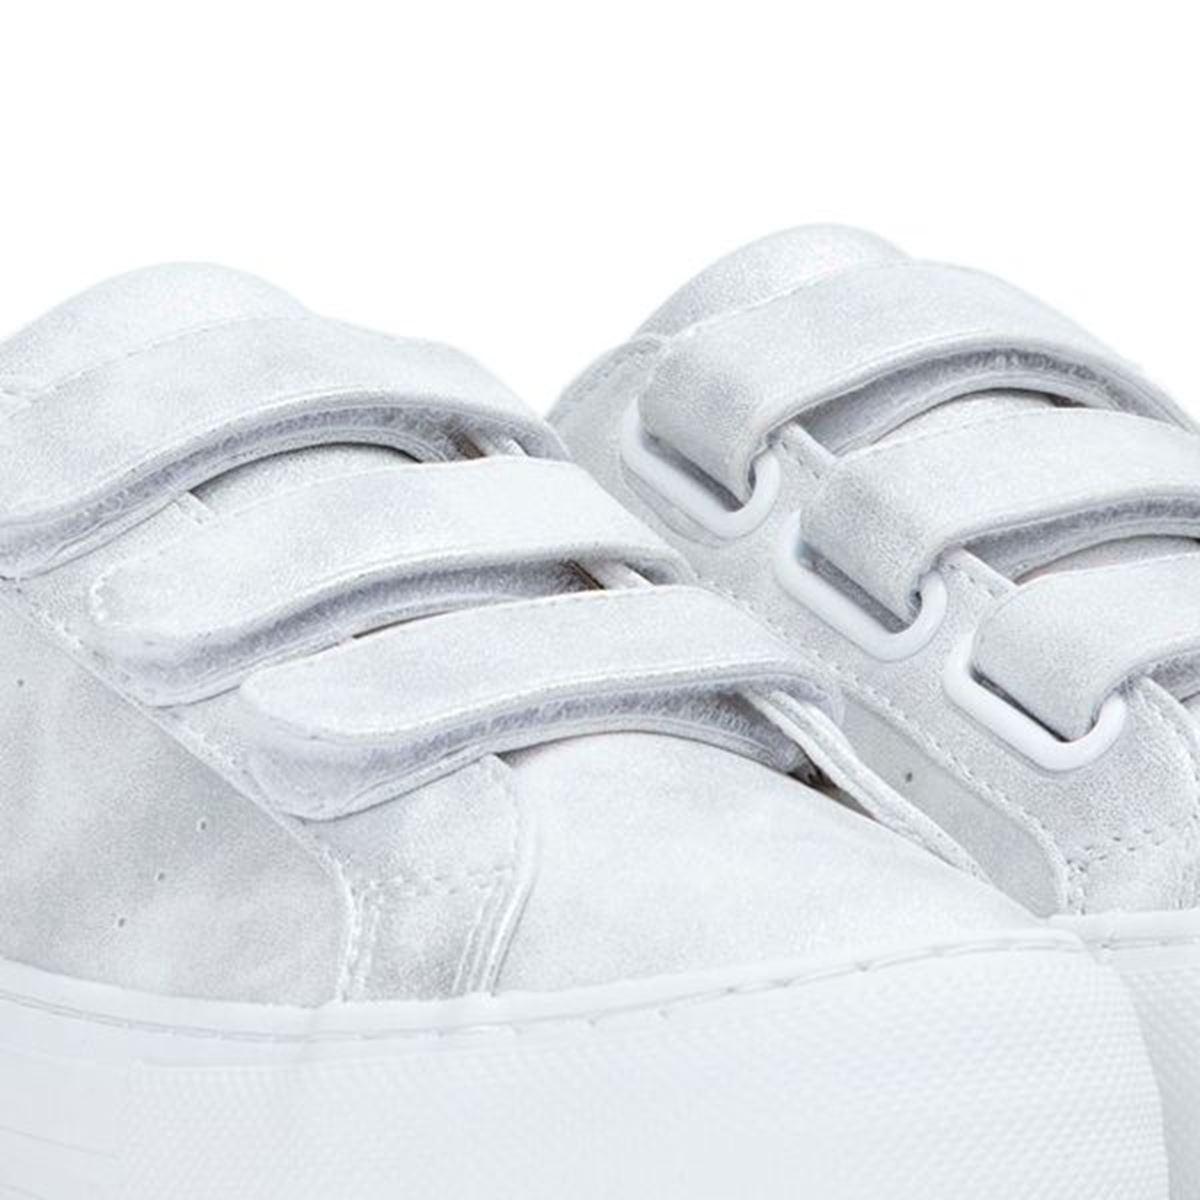 ARCADE-11220-WHITE アルカデ ホワイト